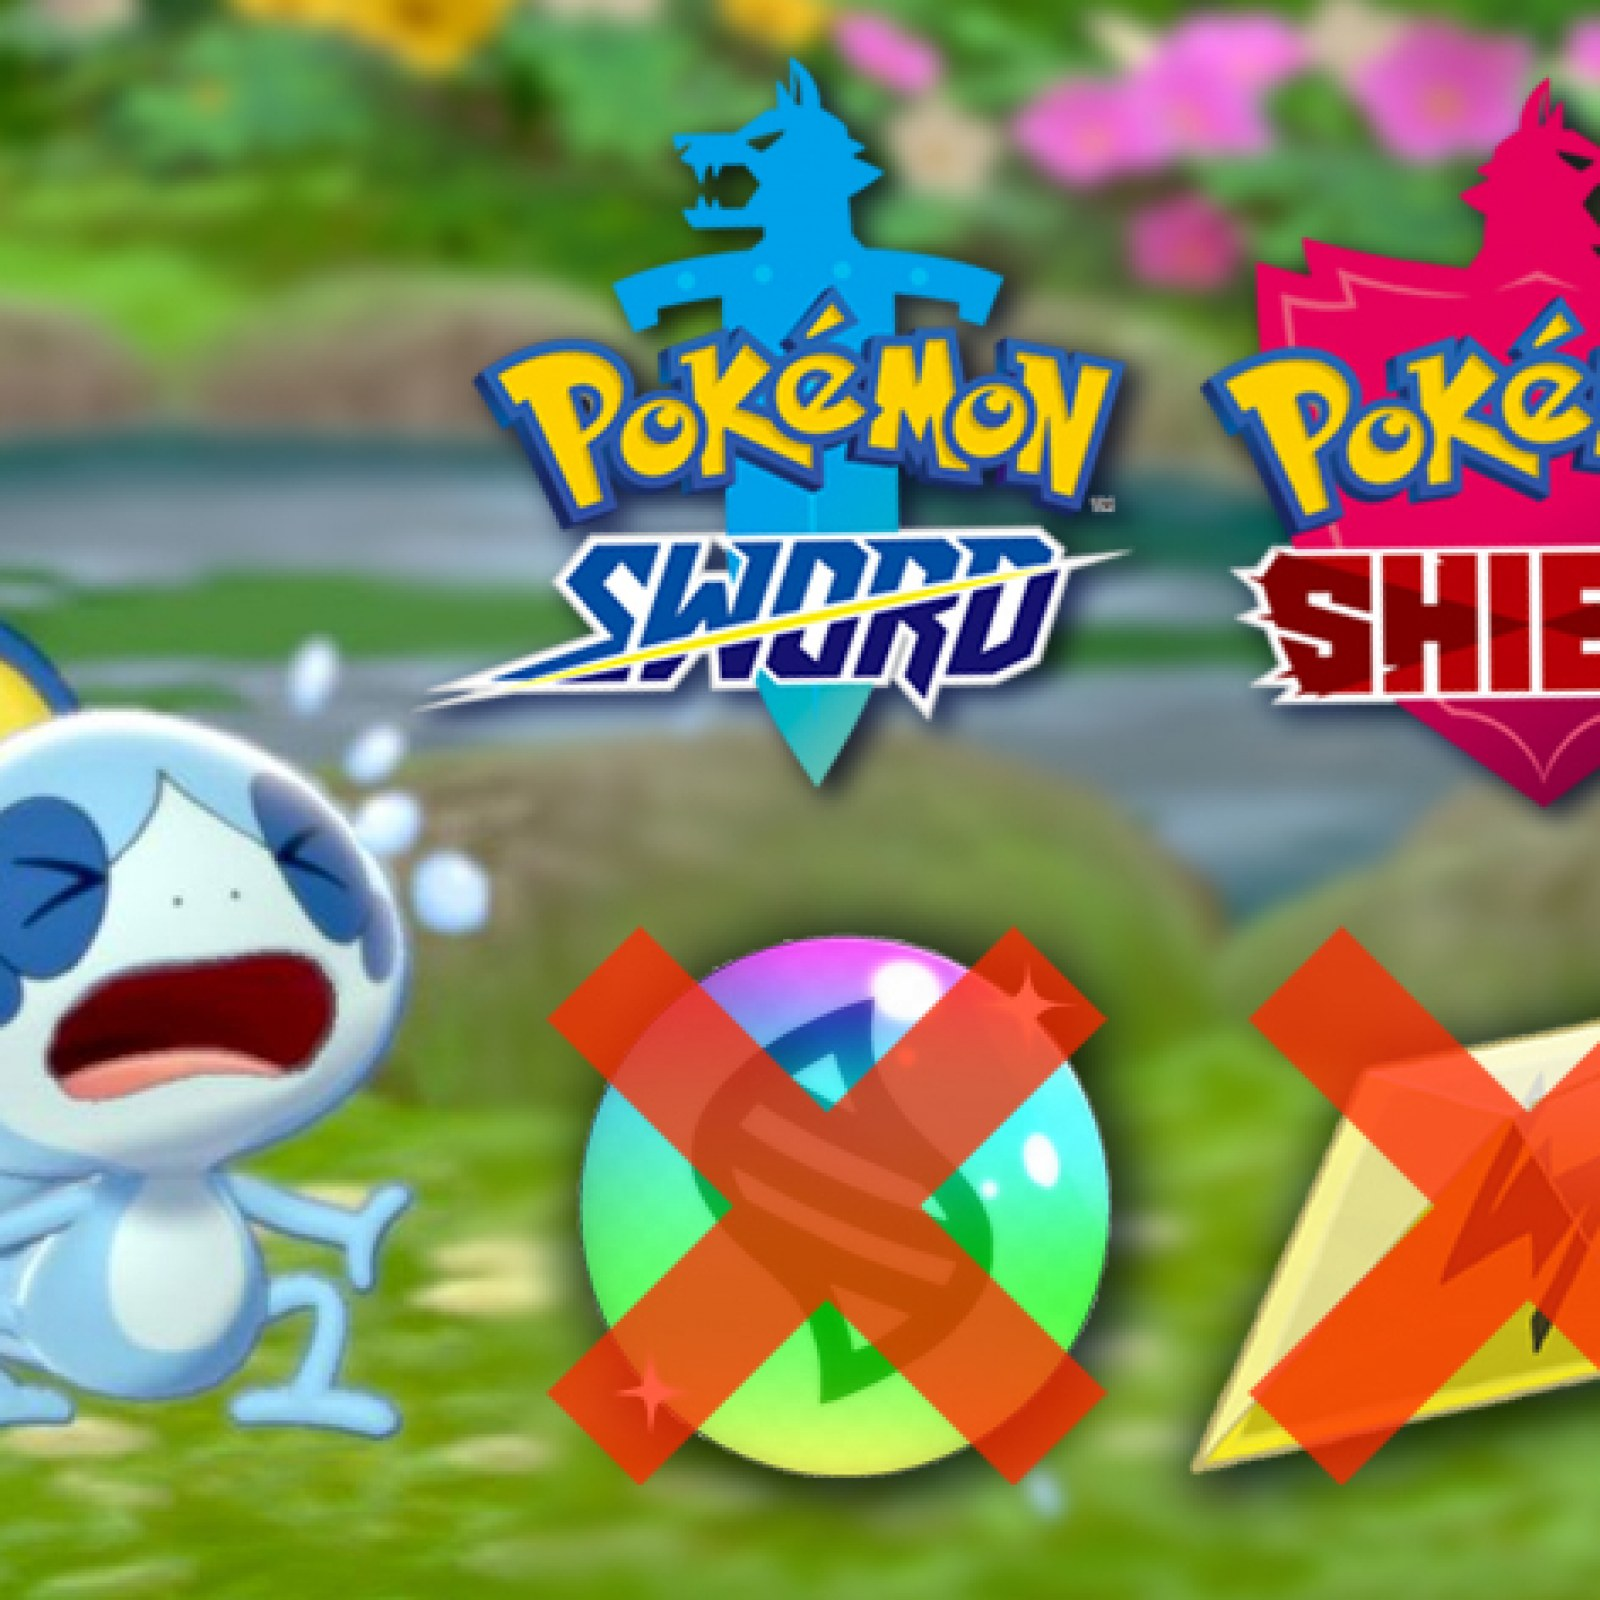 Pokémon Sword and Shield' Producer Confirms Mega Evolutions and Z